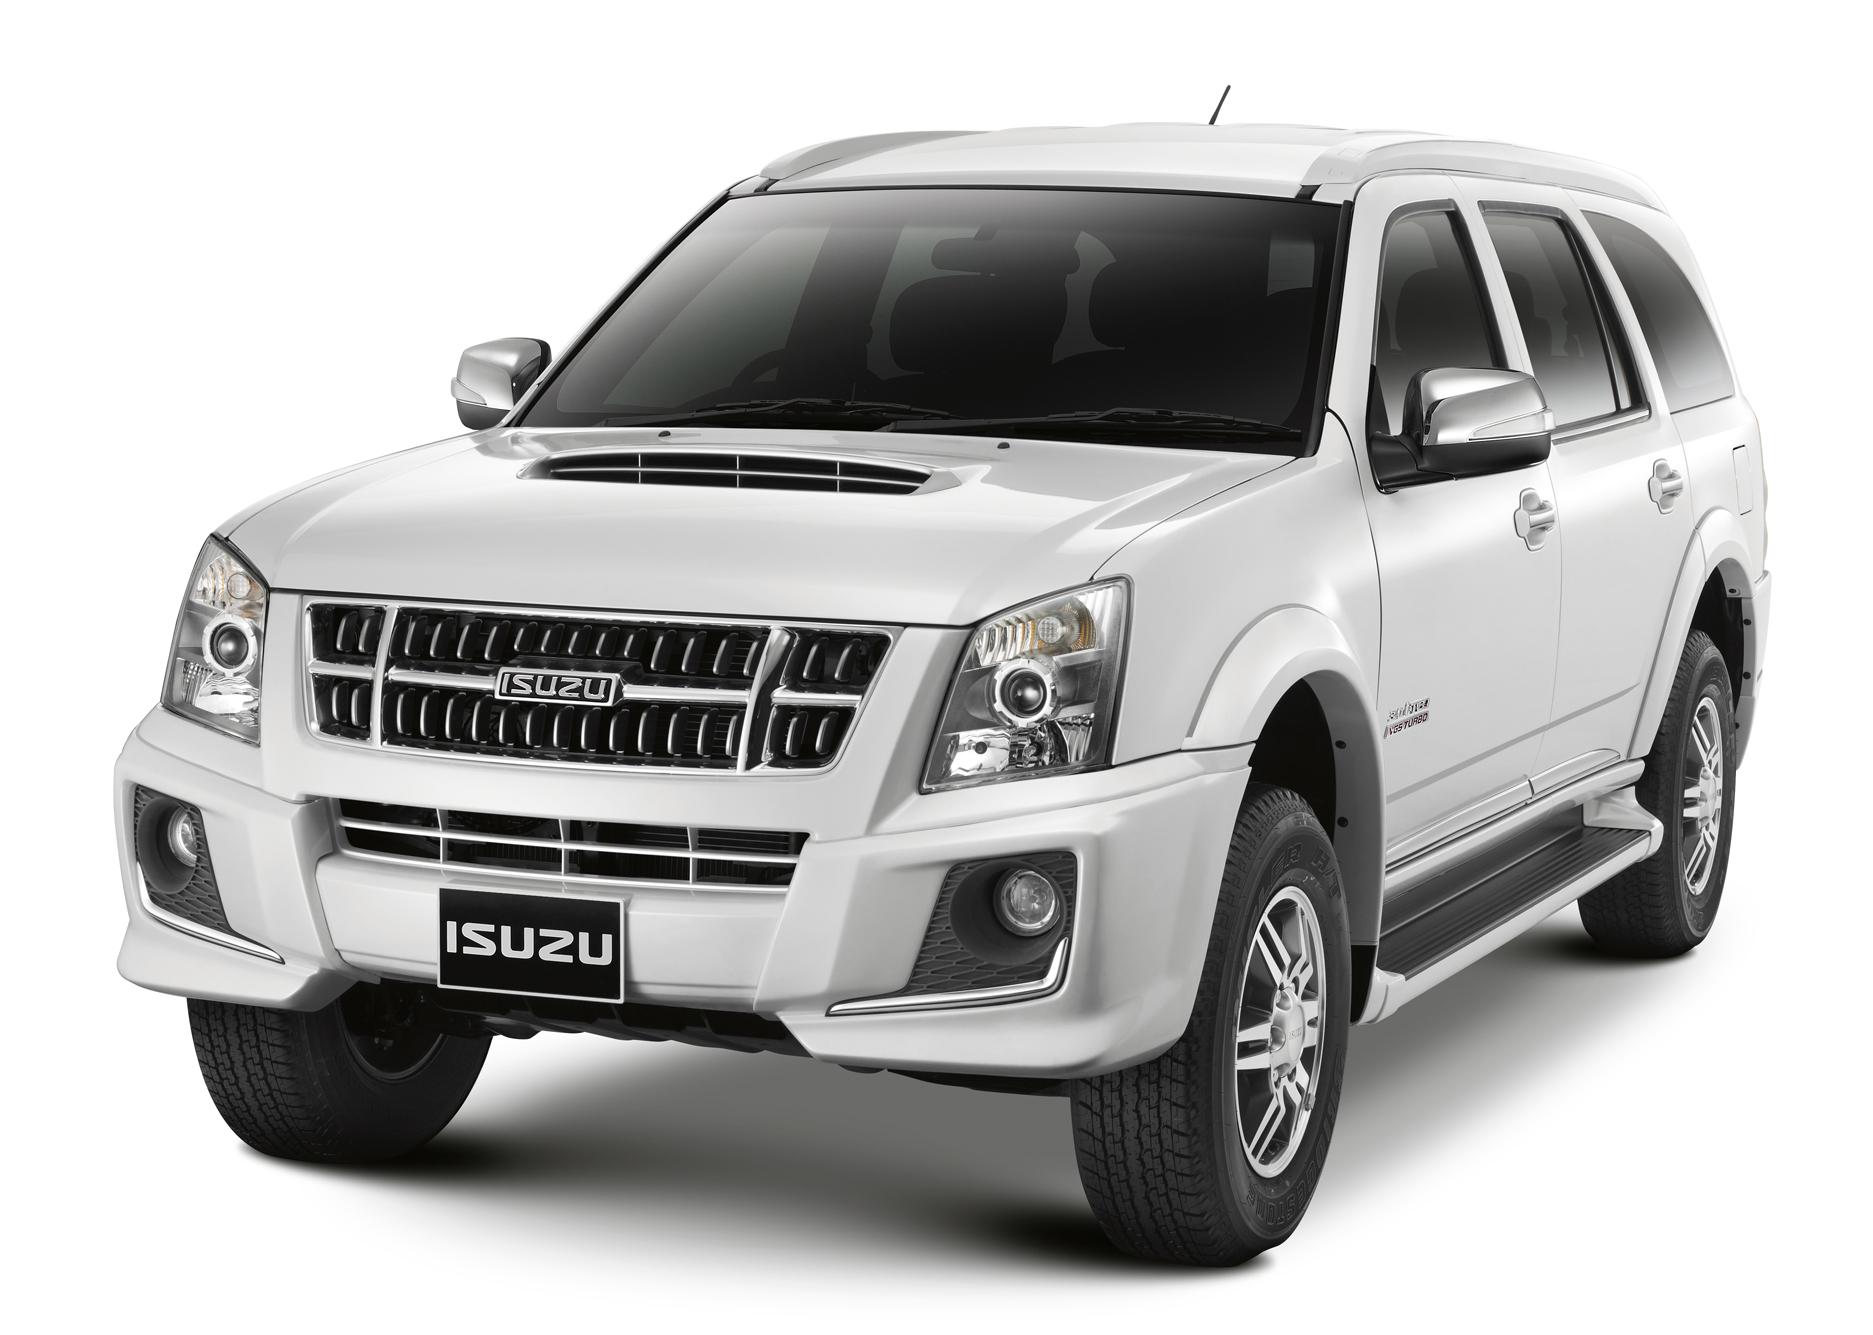 Isuzu Motors India Finalizes Agreement With Hindustan